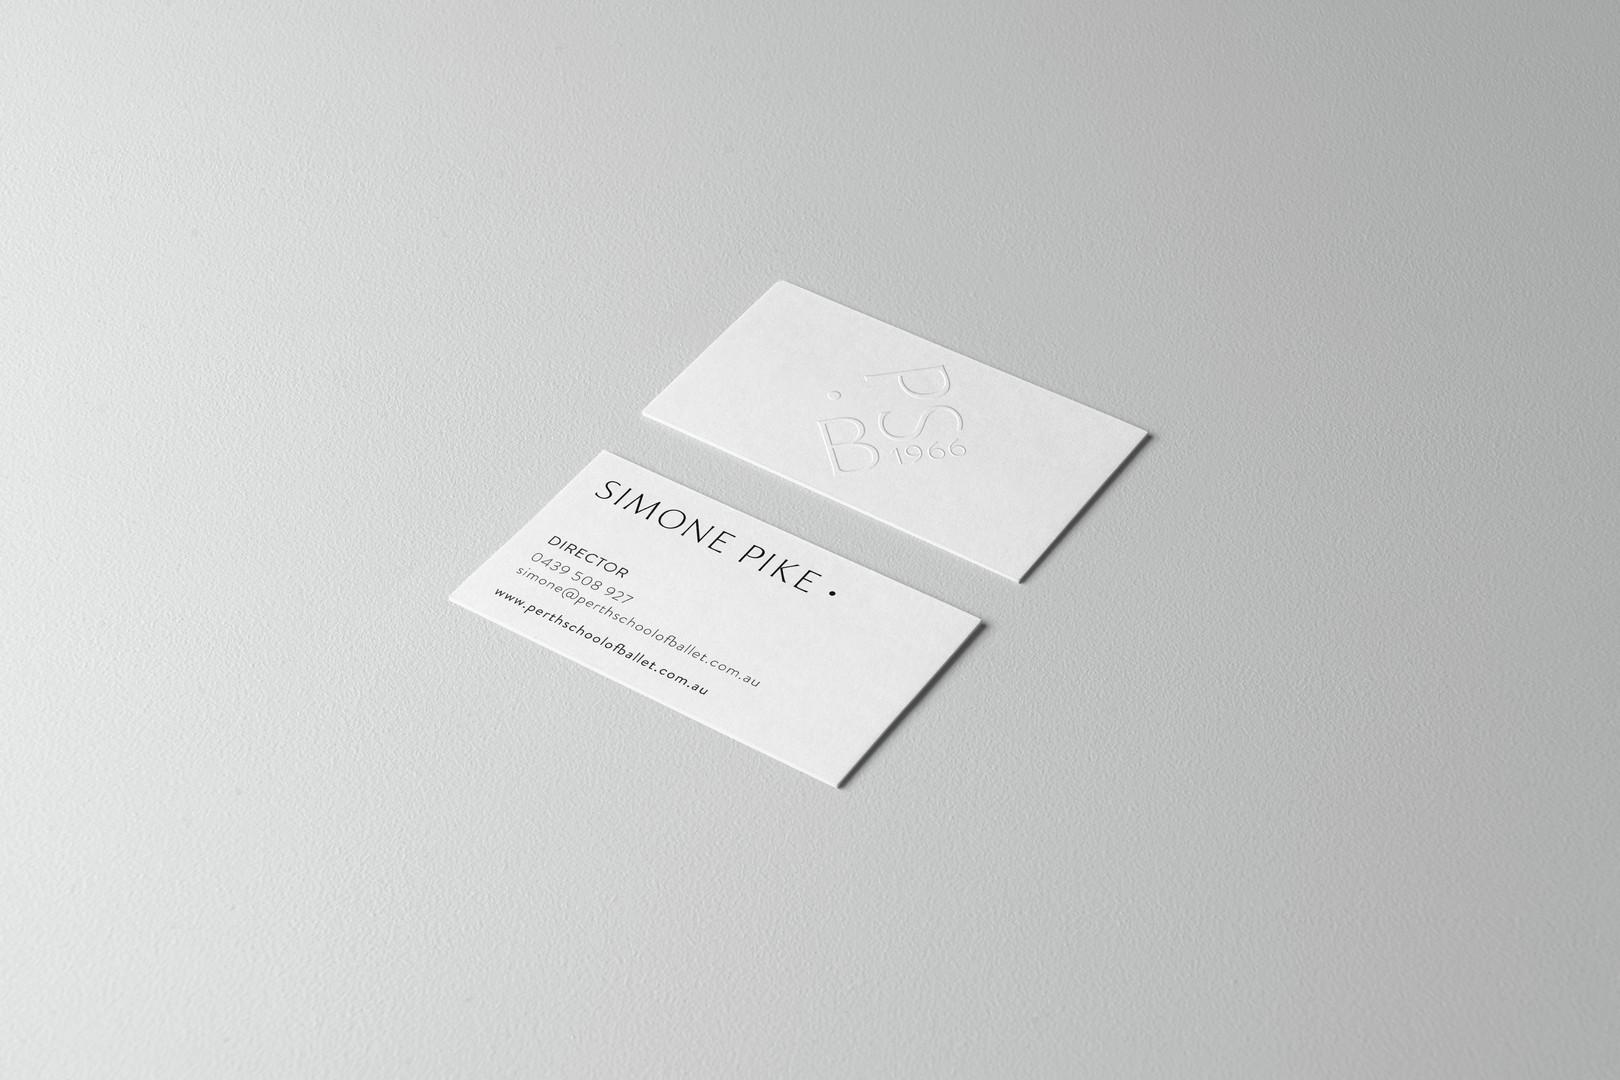 PSB Business Card Memboss.jpg